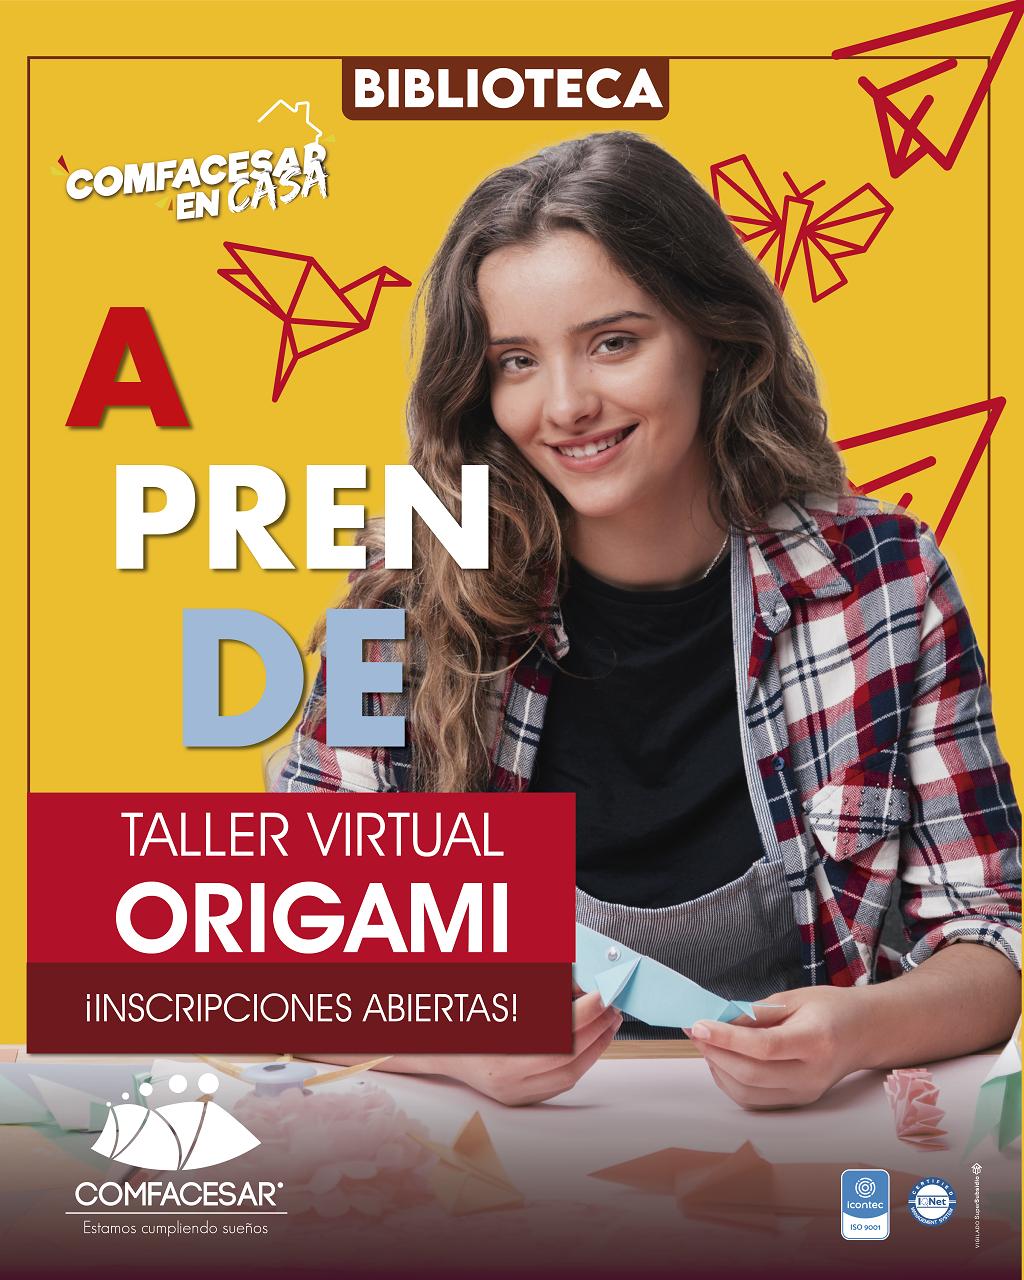 OrigamiVirtual